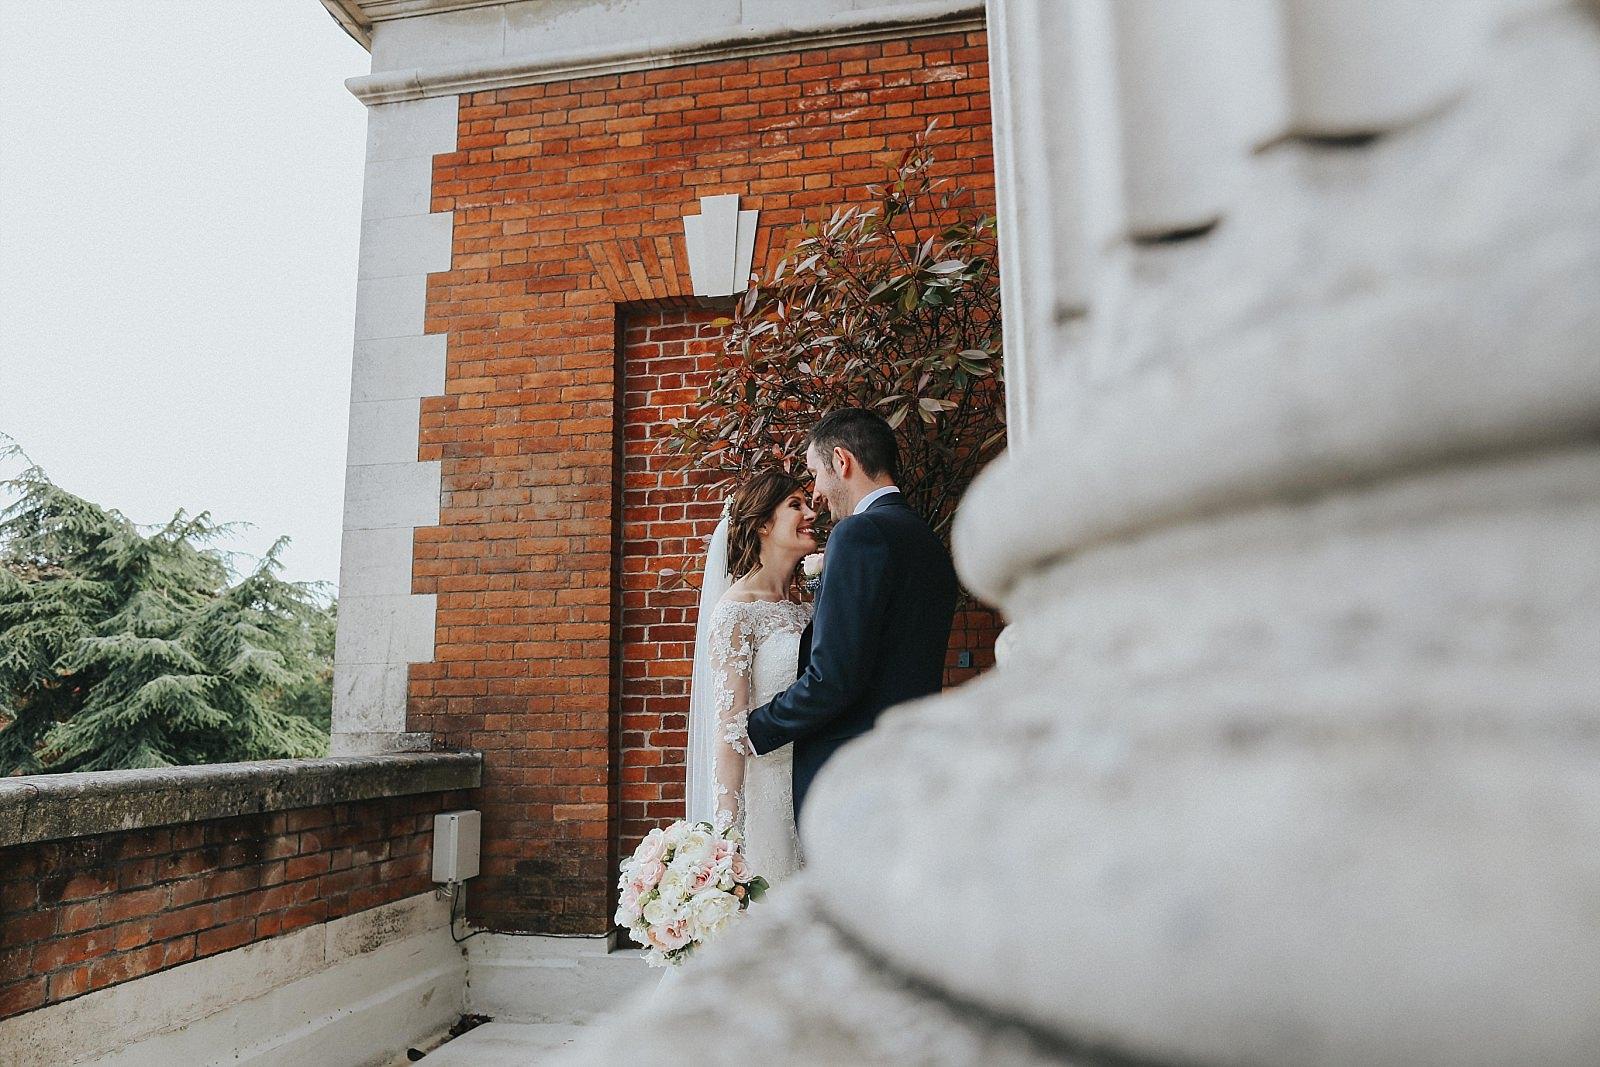 eaves hall wedding photographer spying on the newlyweds